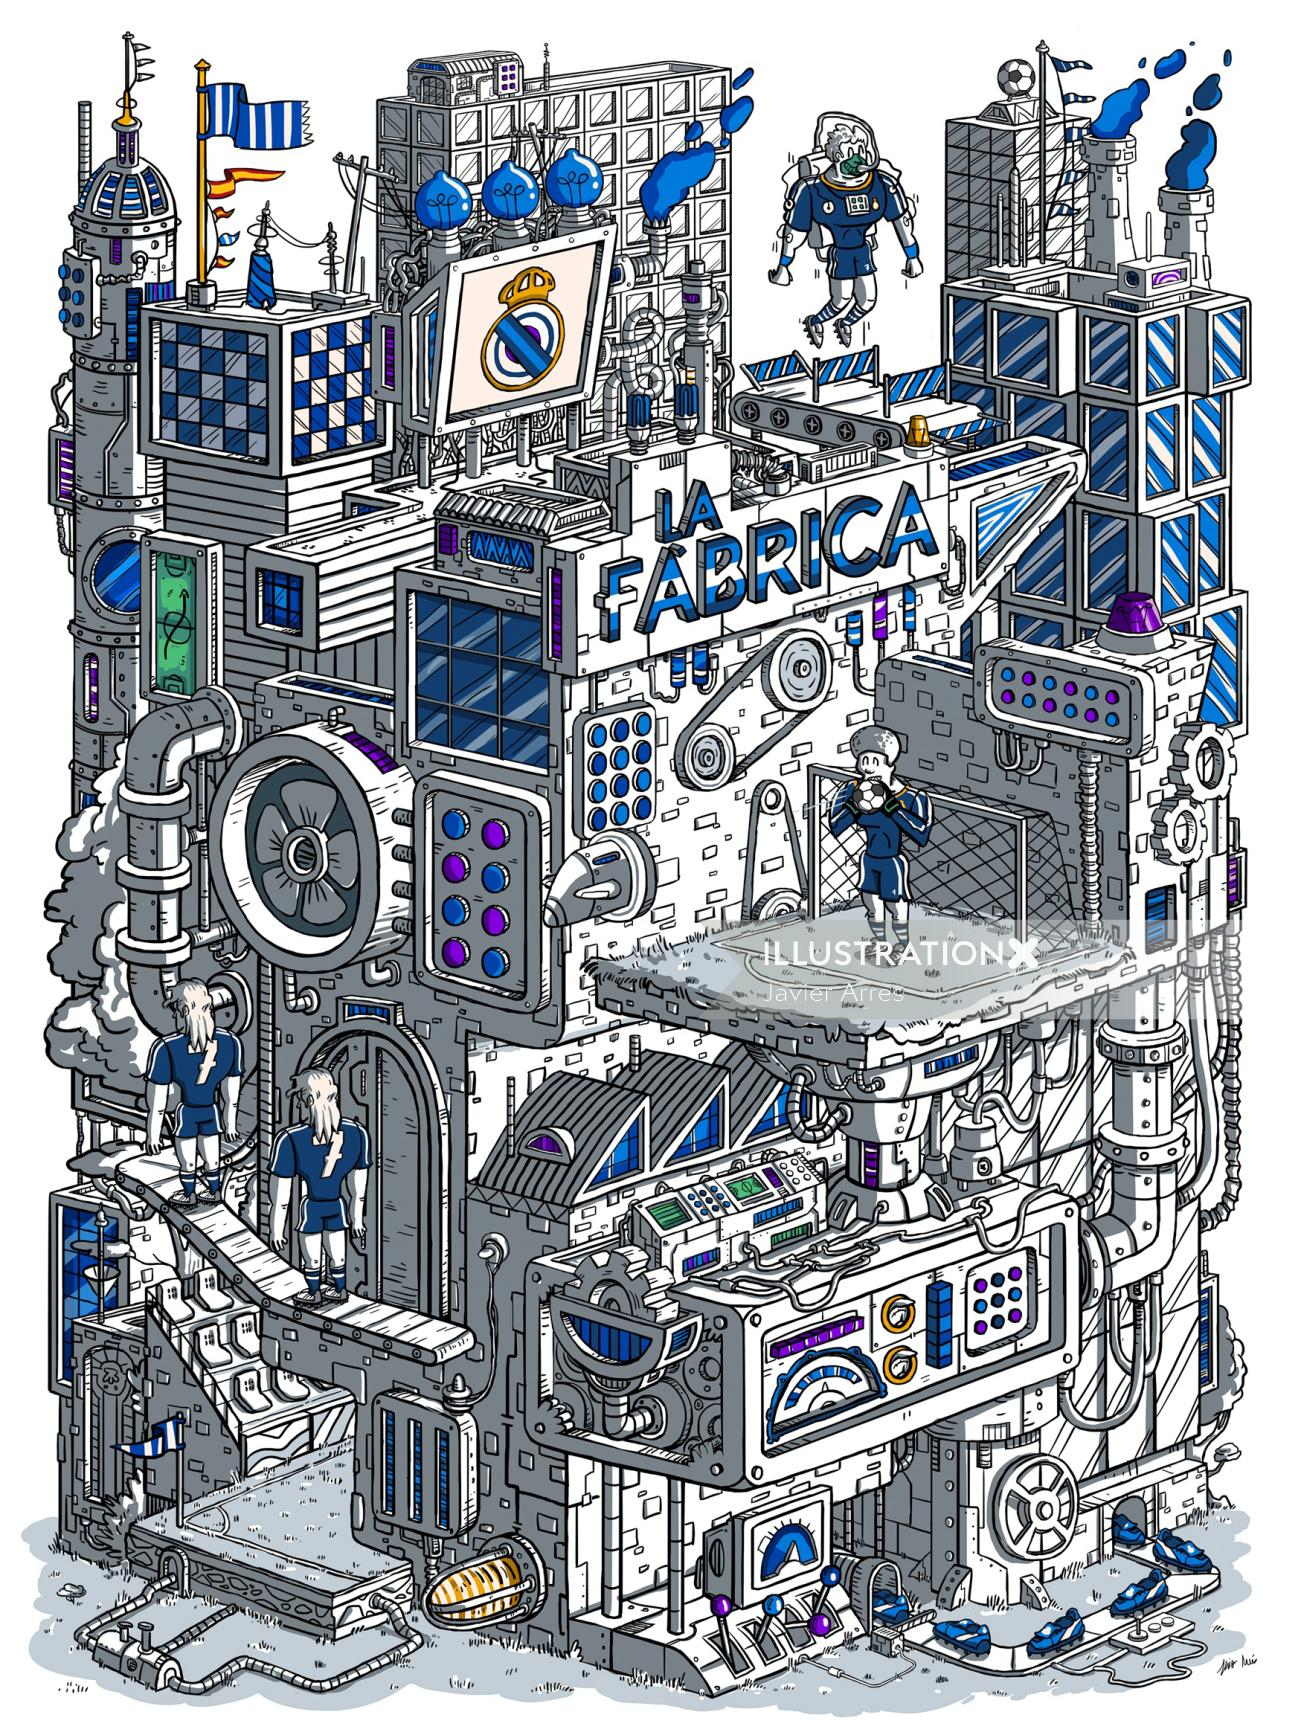 Illustration of LA Fabrica building